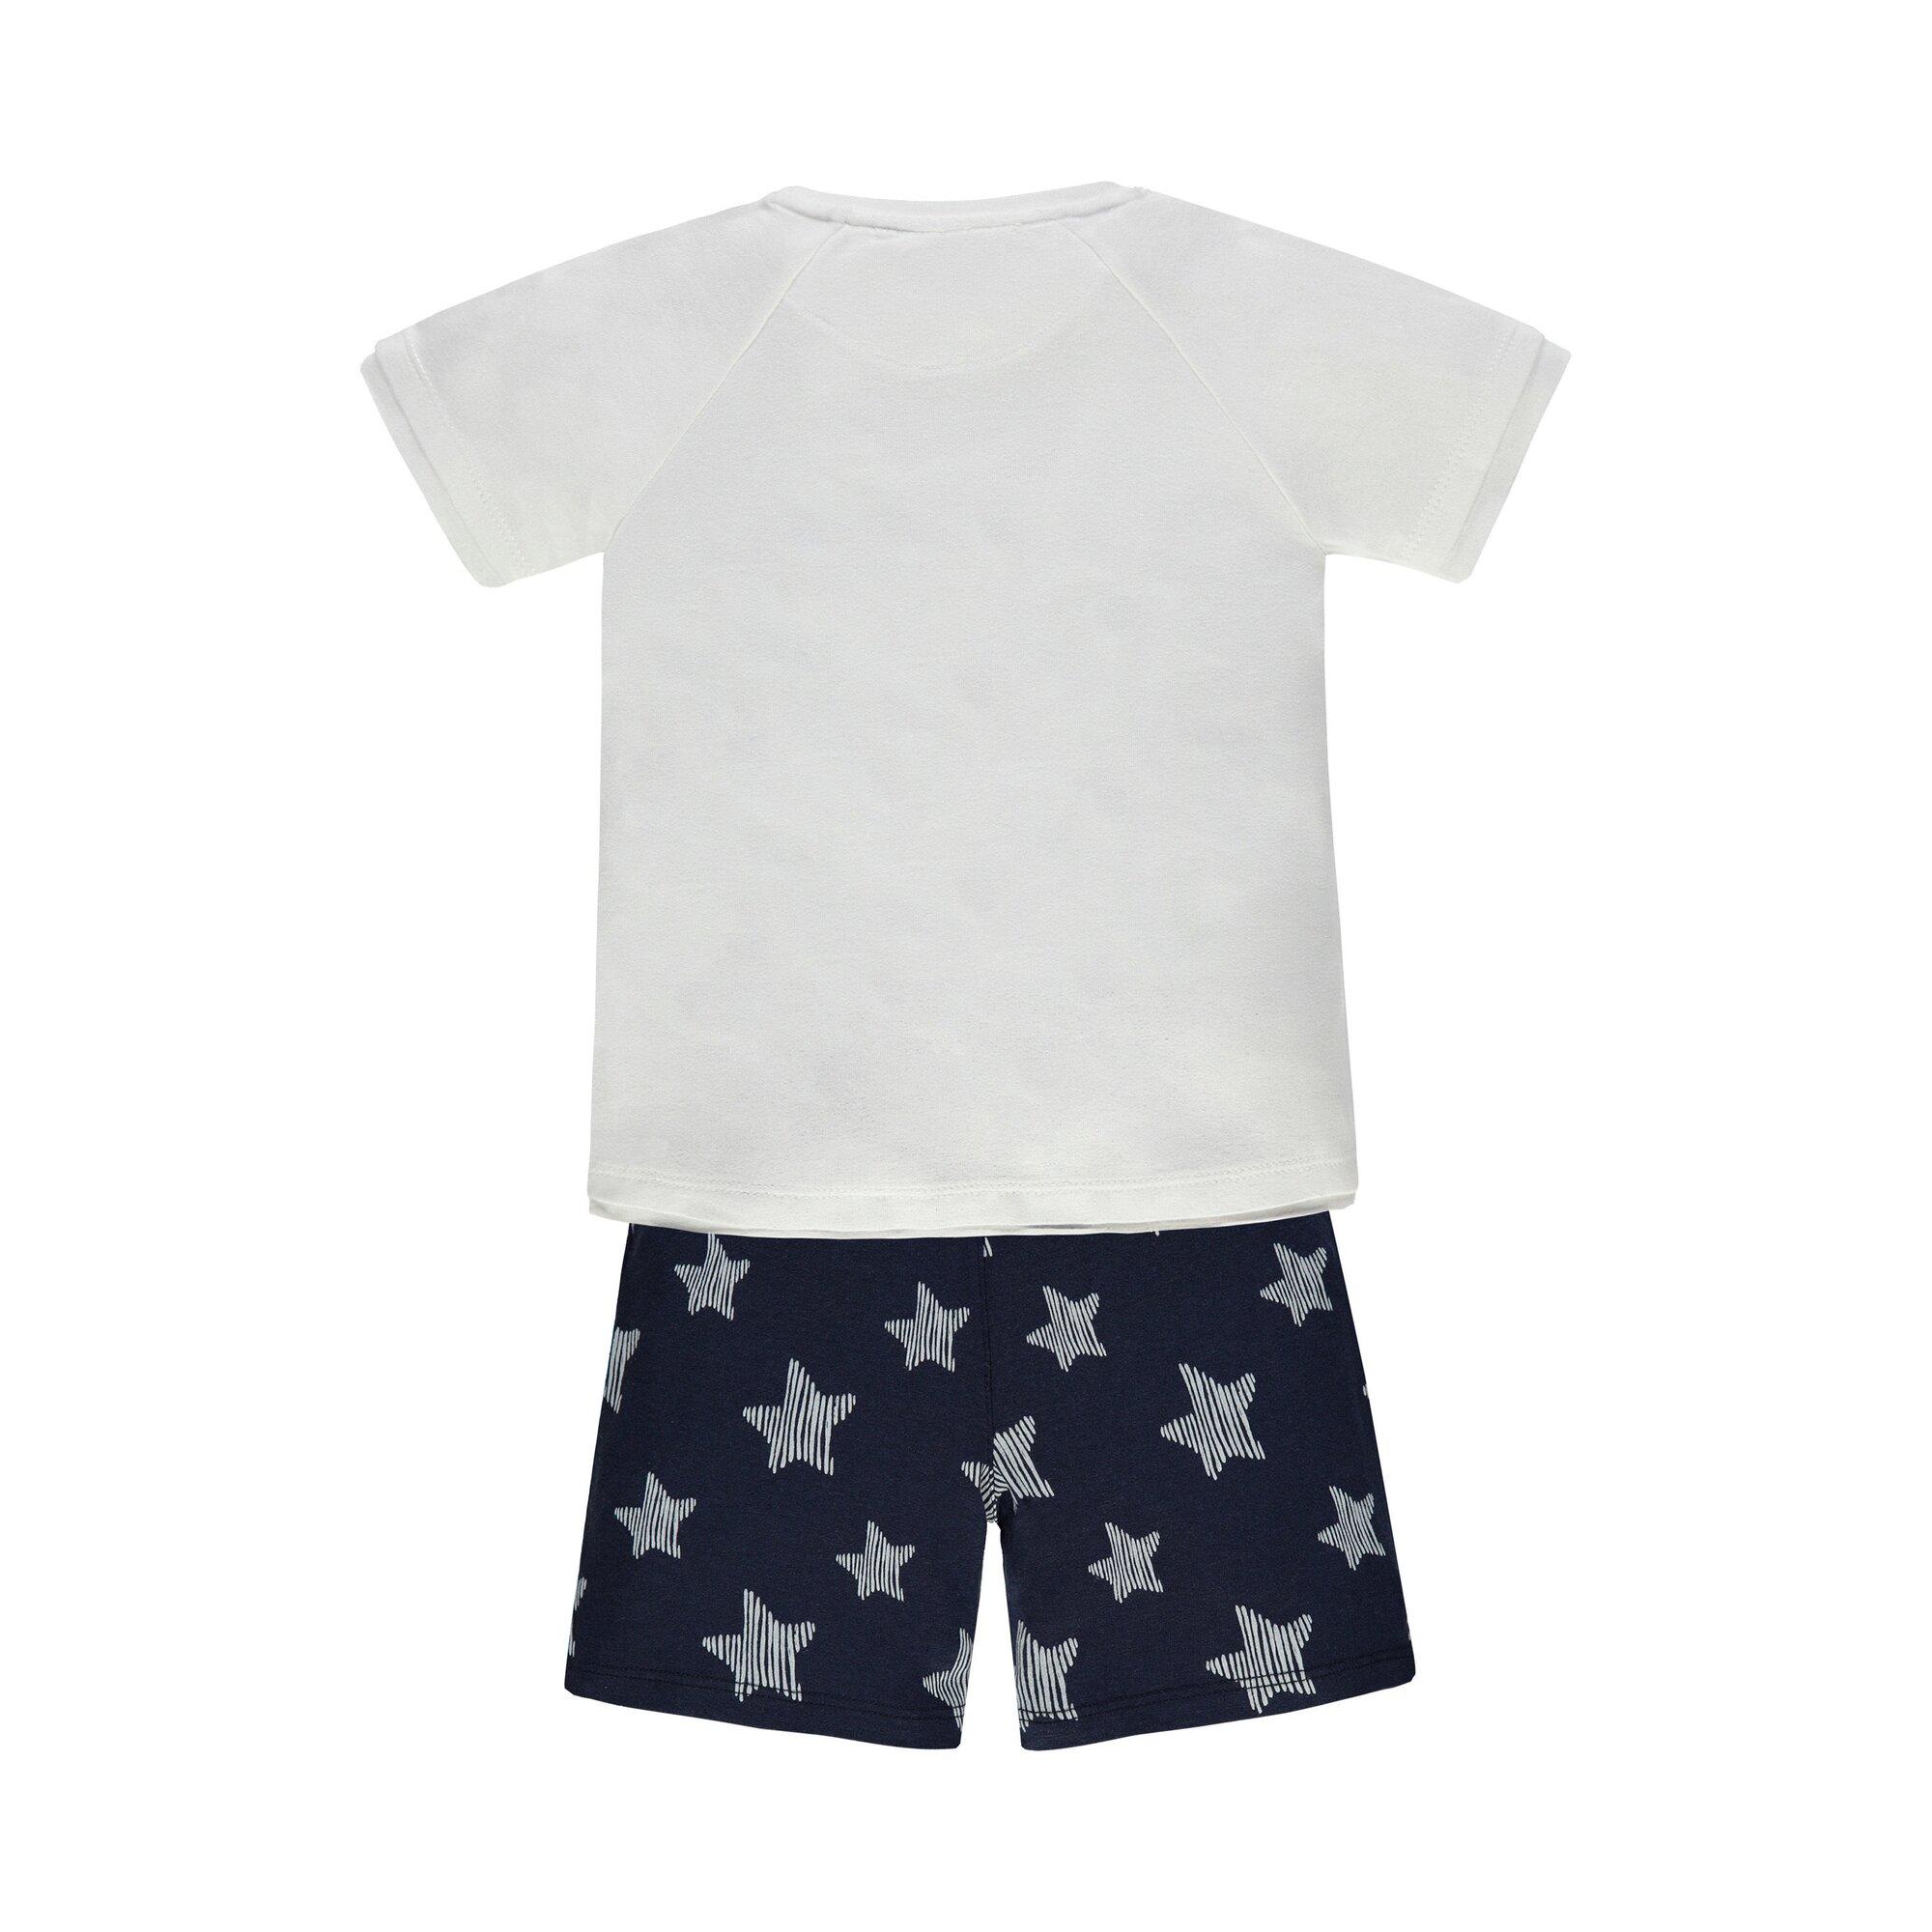 bellybutton-schlafanzug, 24.95 EUR @ babywalz-de